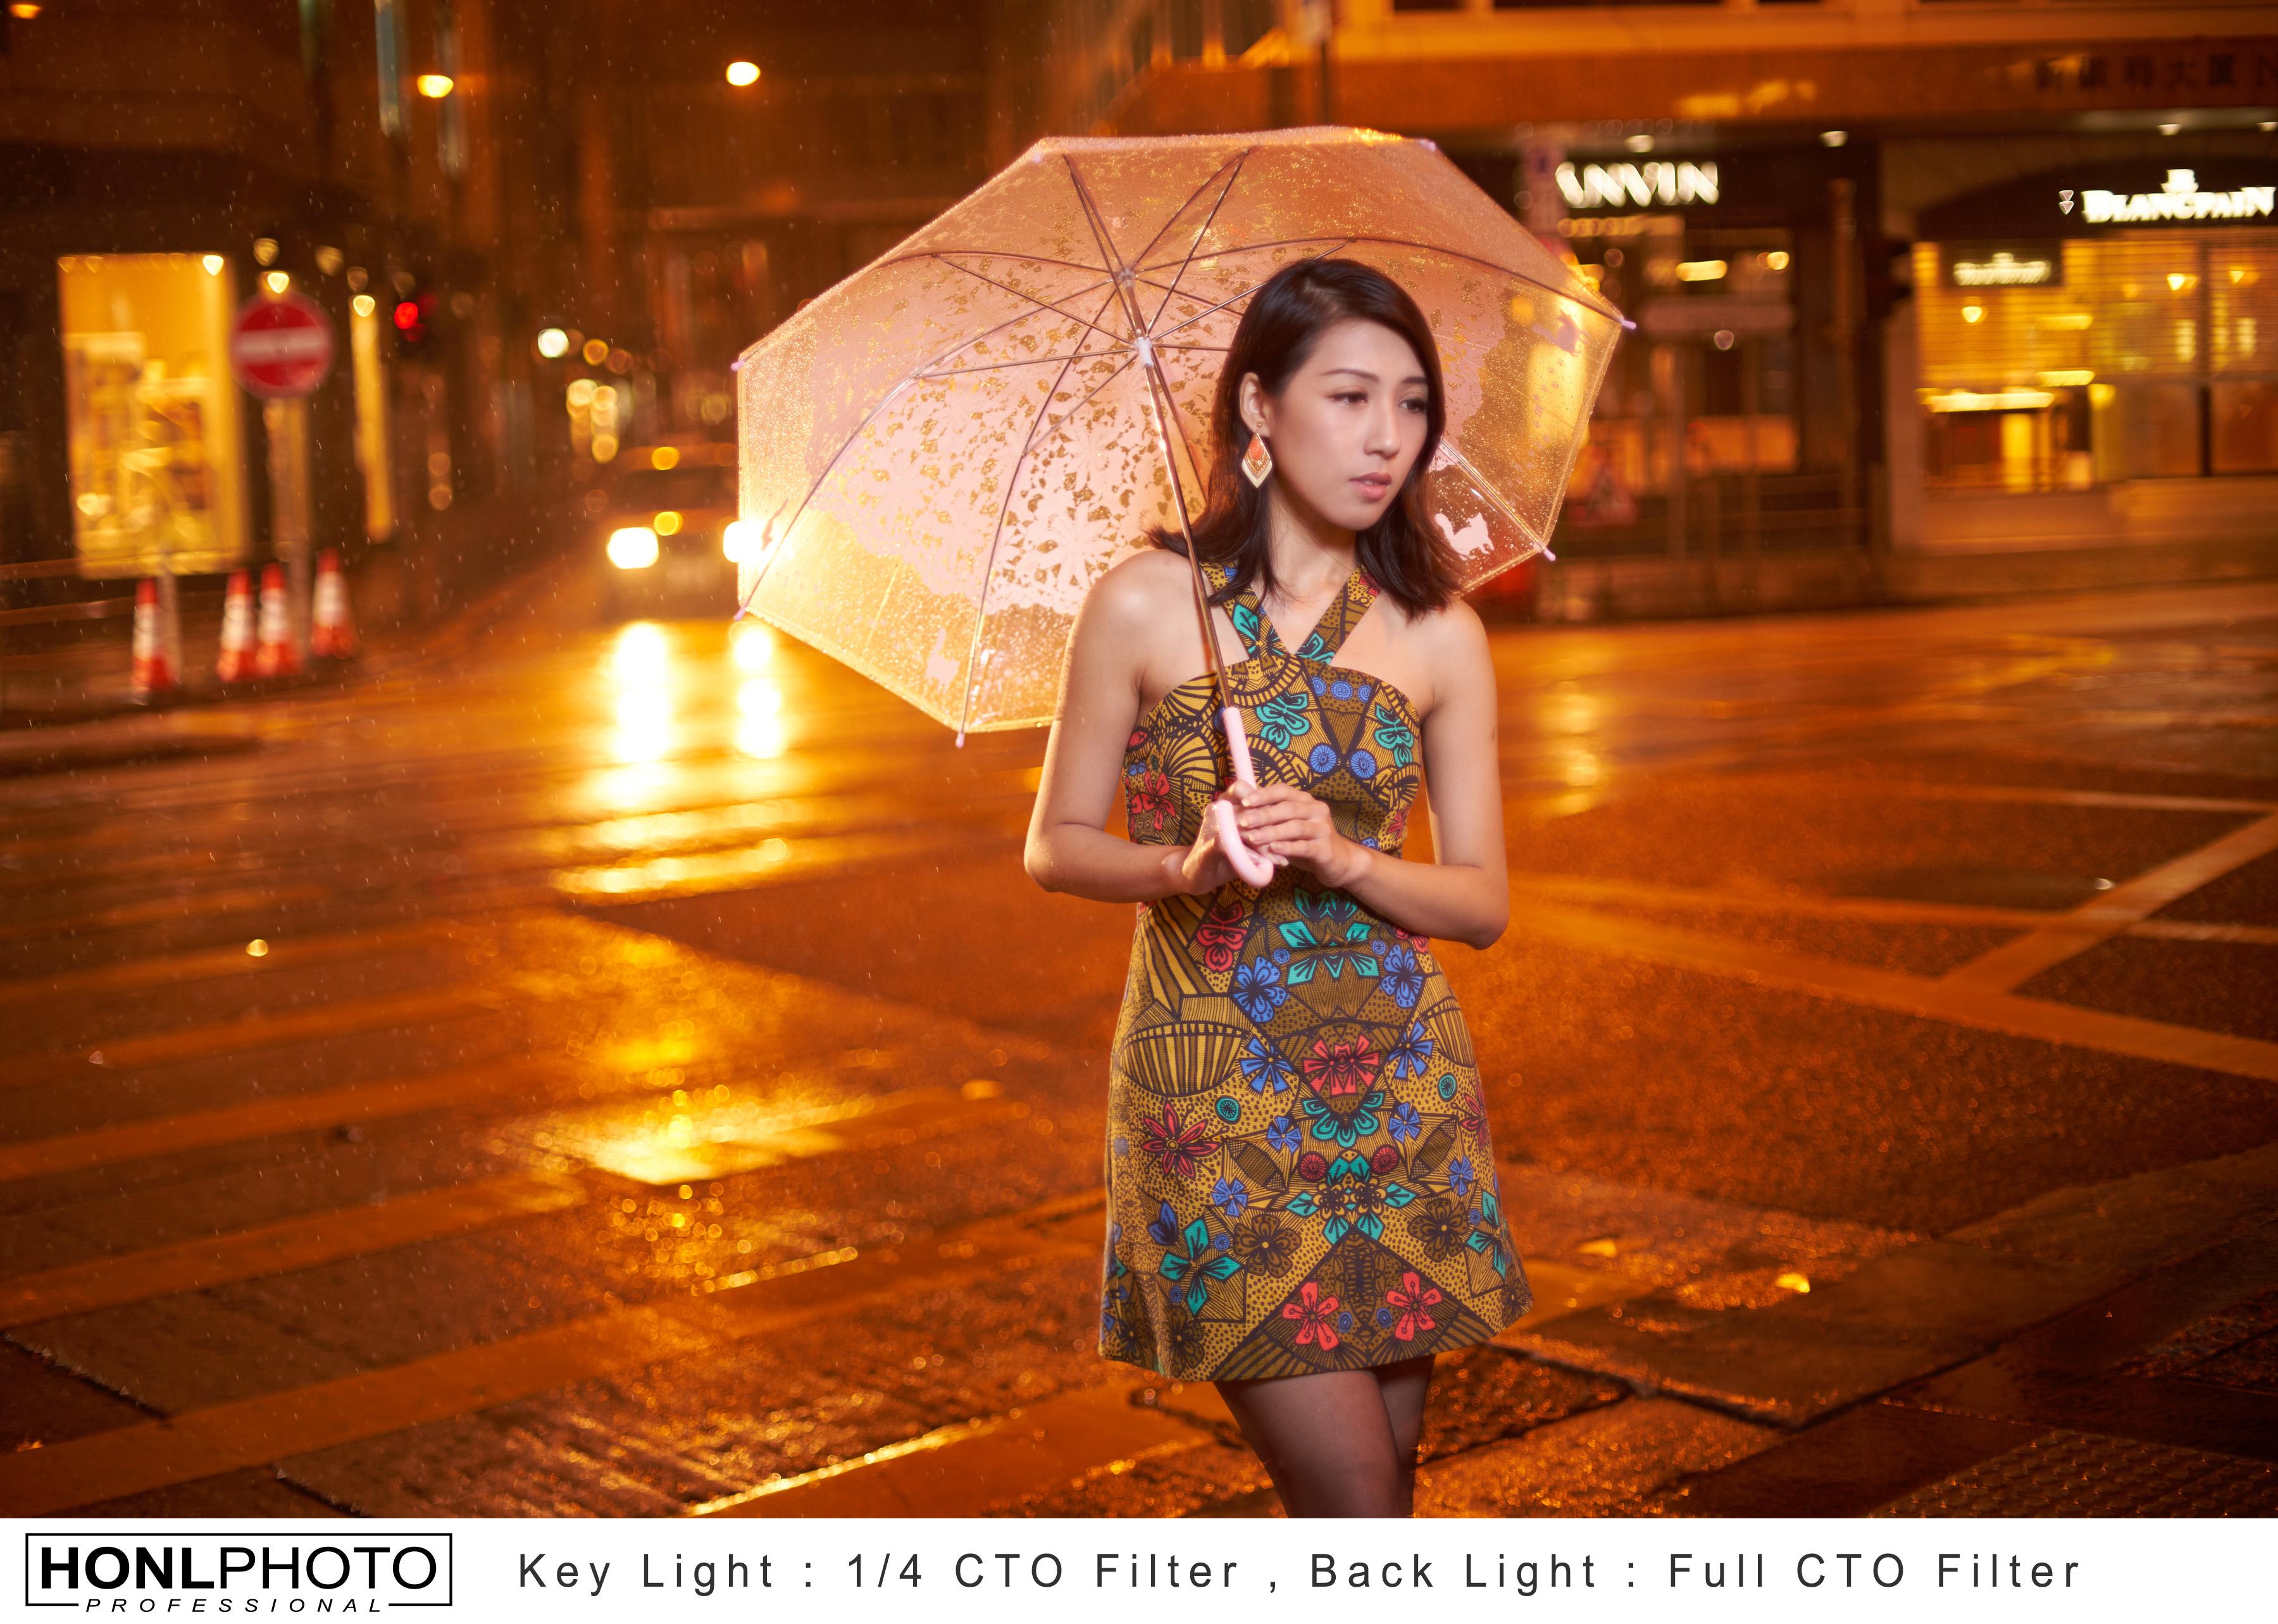 HonlPhoto – 輕便燈光套件 – 外拍好幫手。